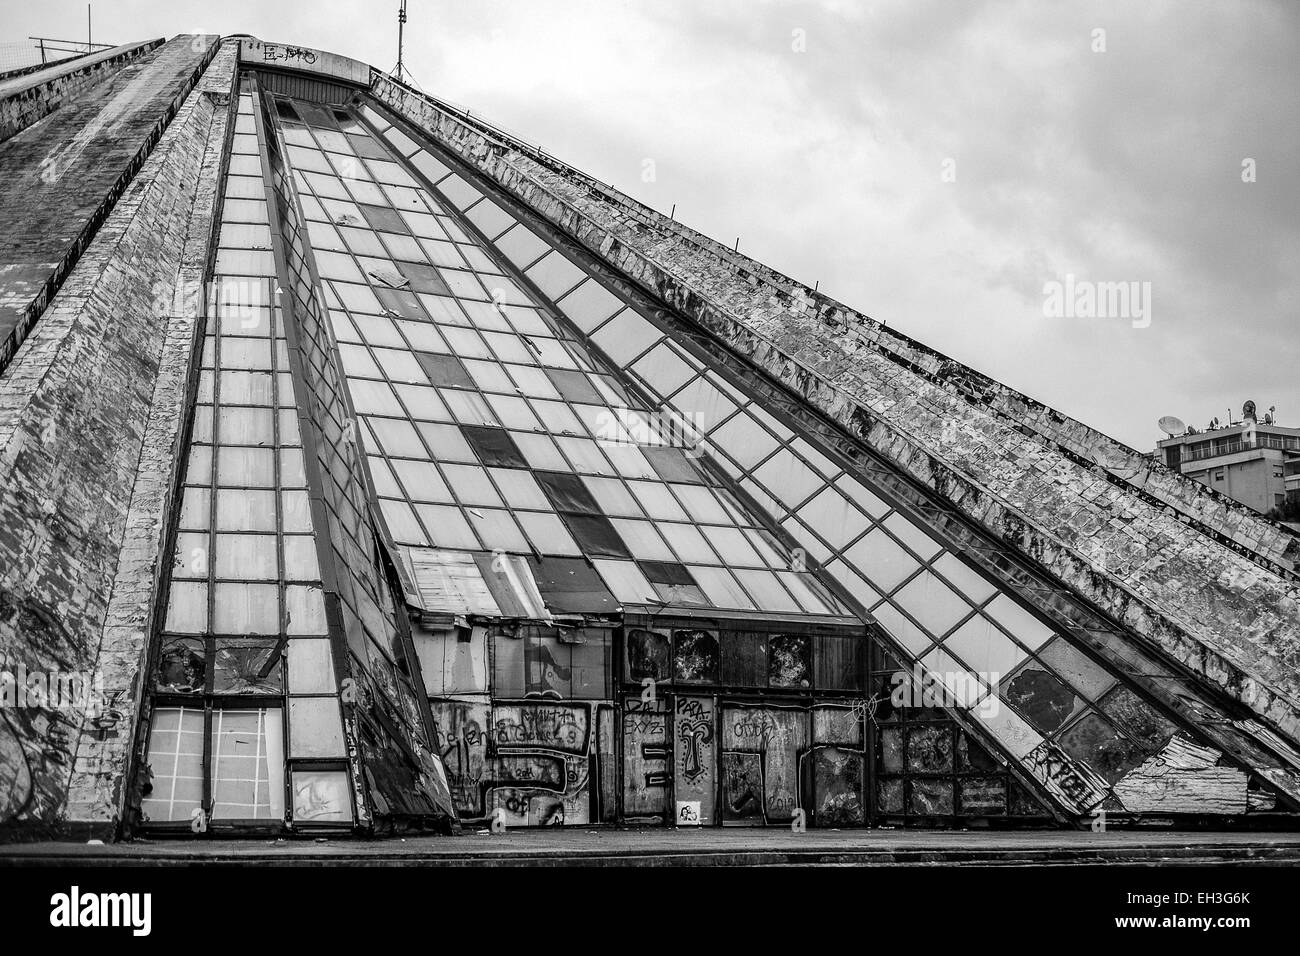 Albania, Tirana, The Pyramid (La Piramida). Built as a mausoleum for the communist dictator Enver Hoxha has been - Stock Image